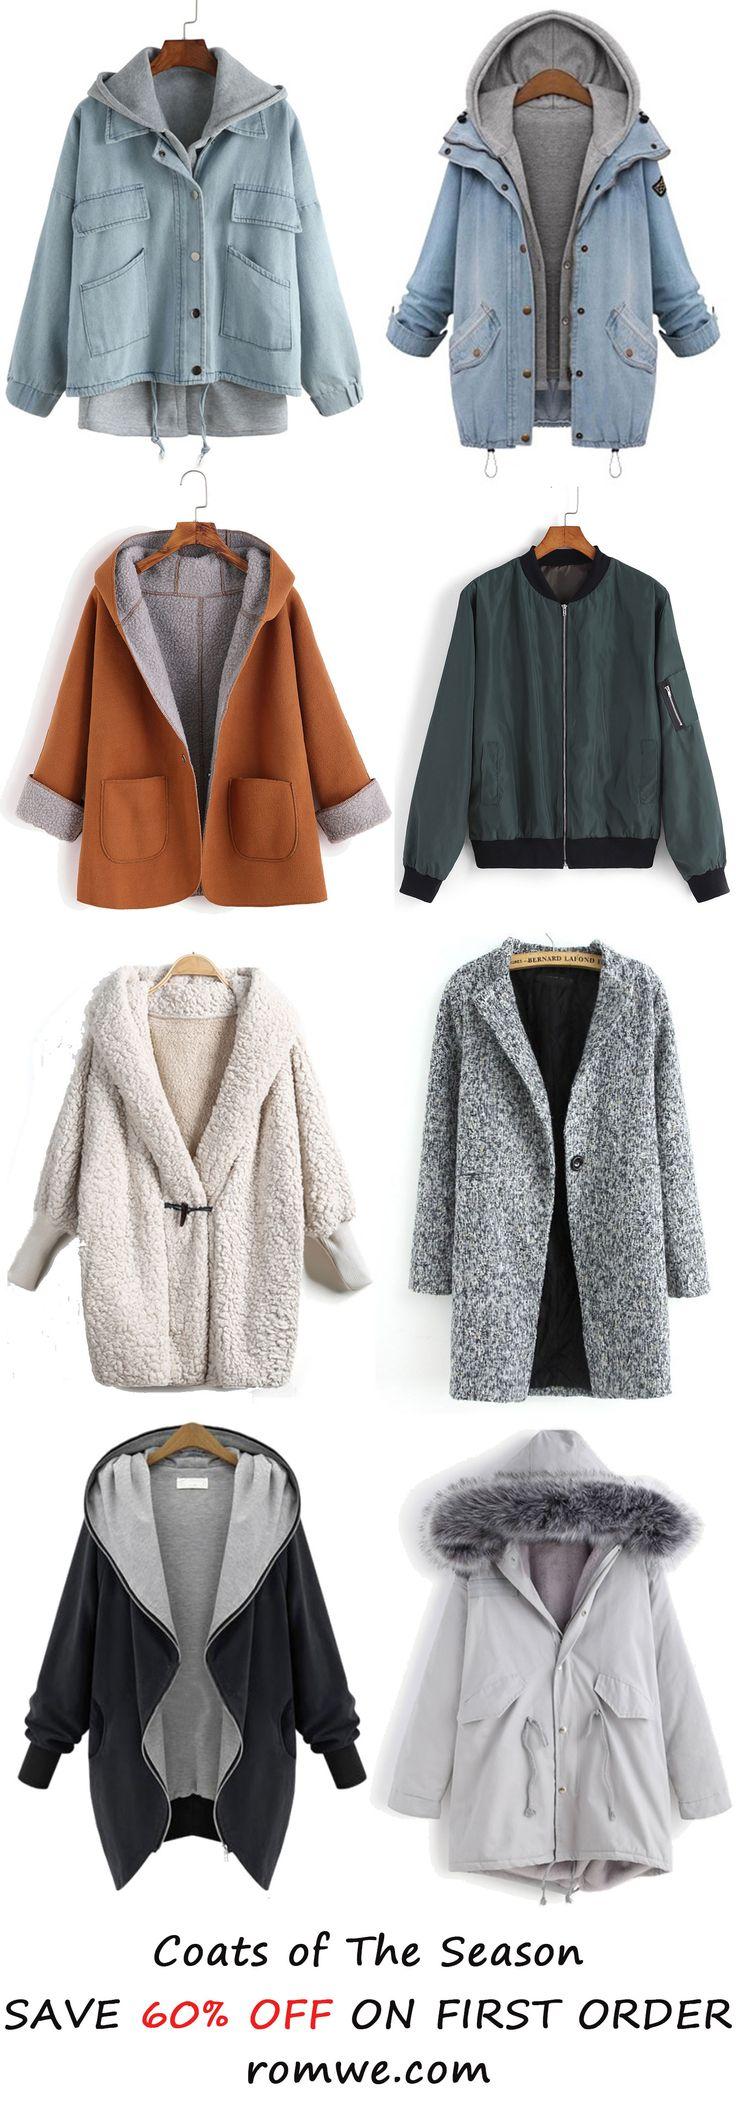 Coats of the season 2016 from romwe.com